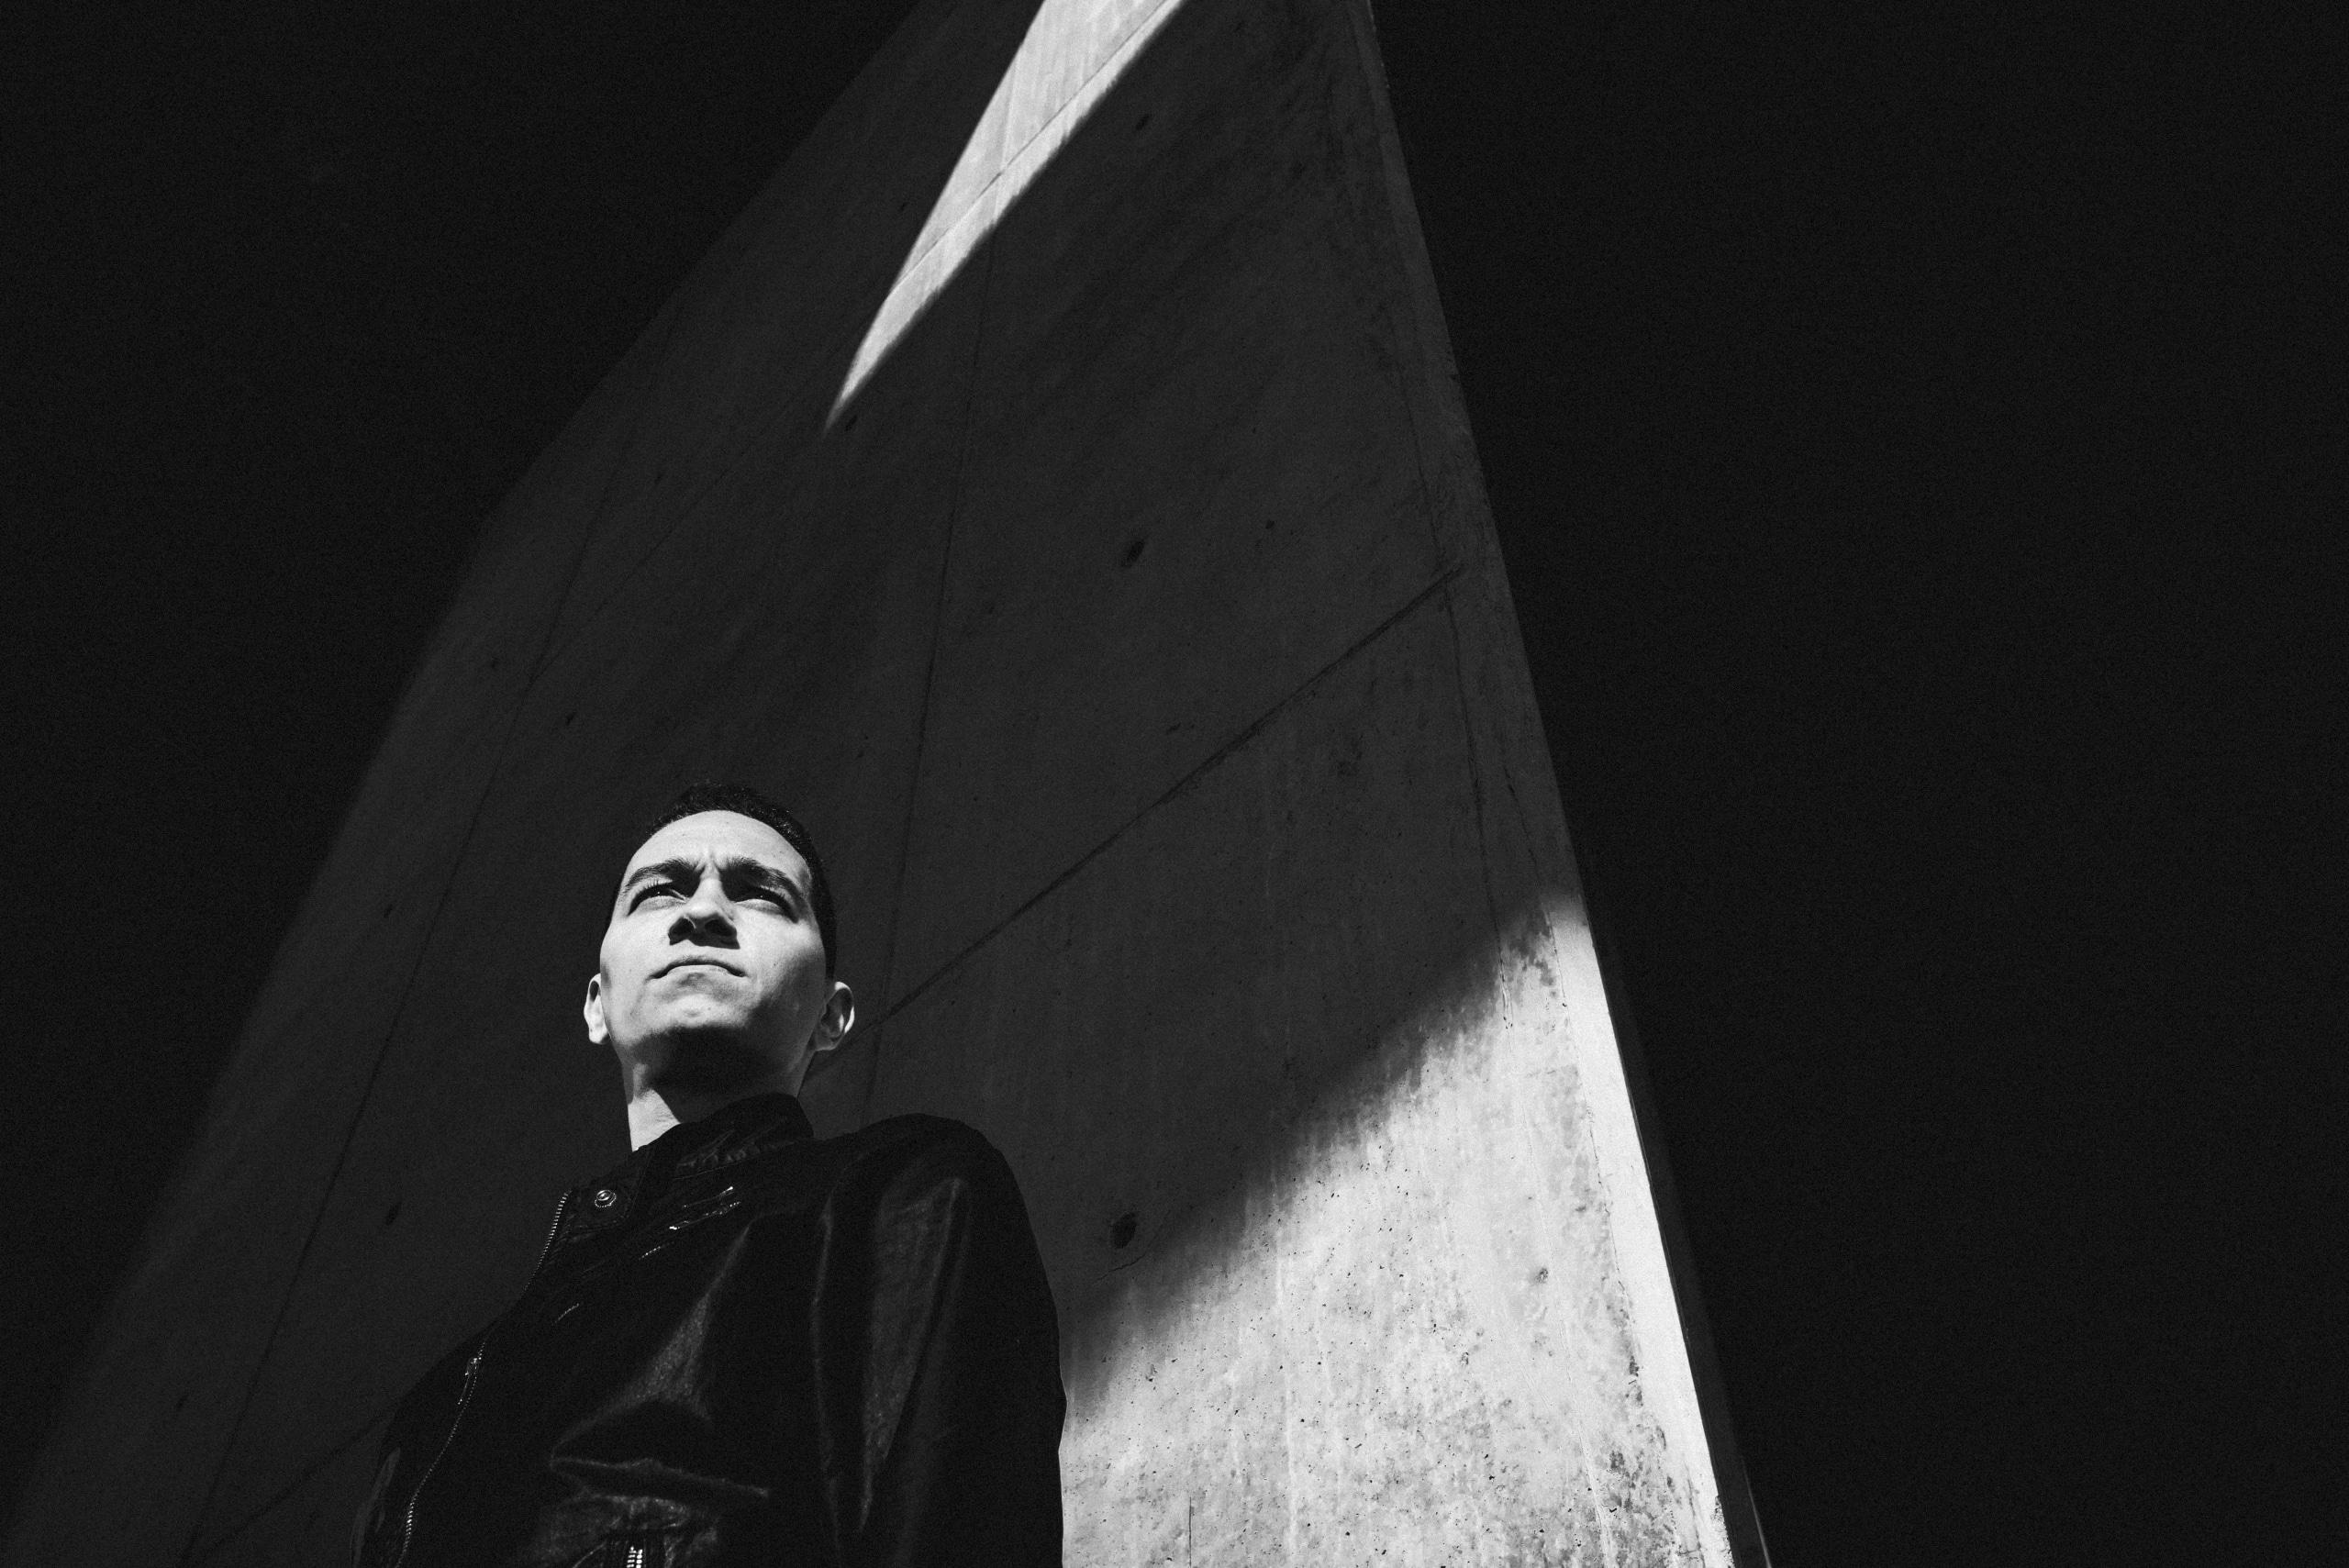 Lucas Freire - Planet Rhythm